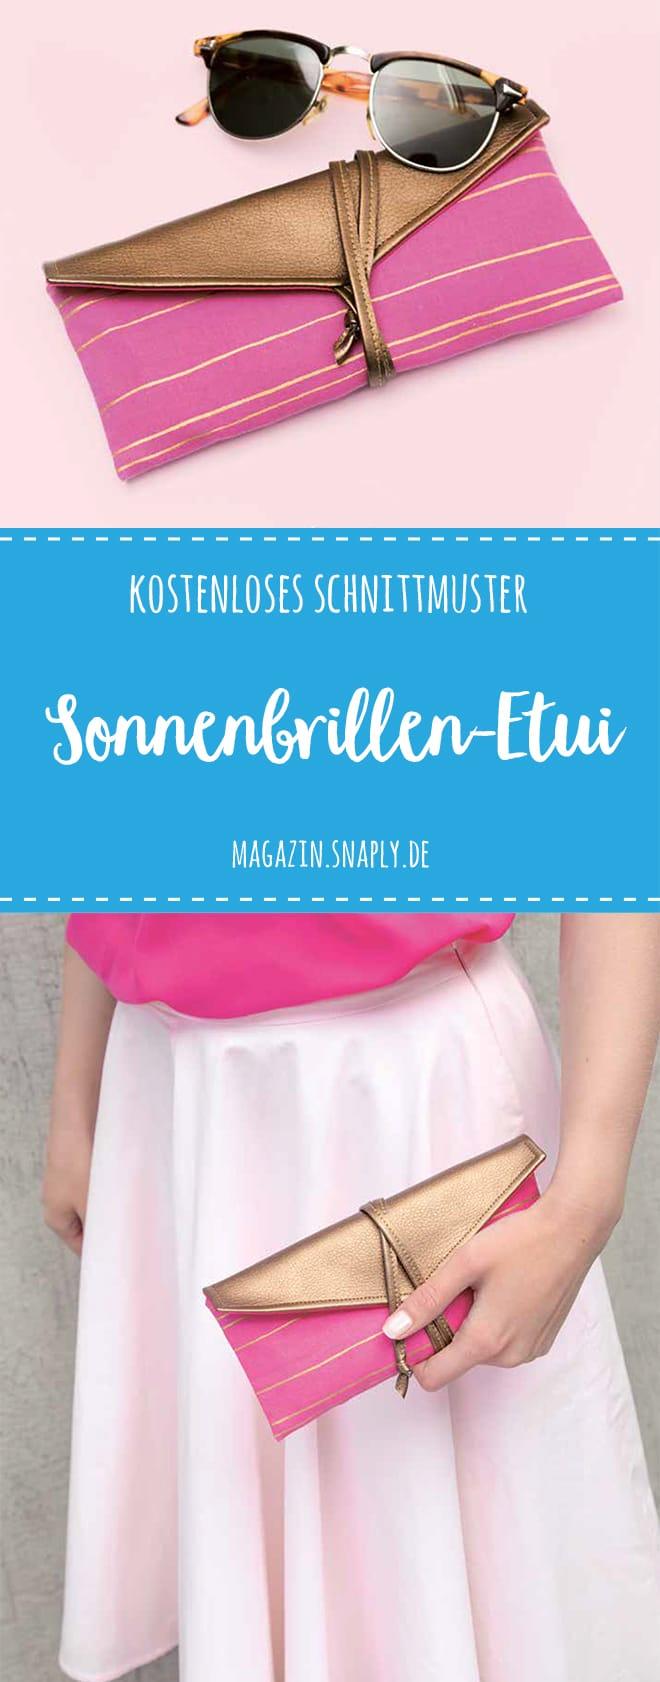 "Kostenloses Schnittmuster: Sonnenbrillen-Etui ""Finja"""